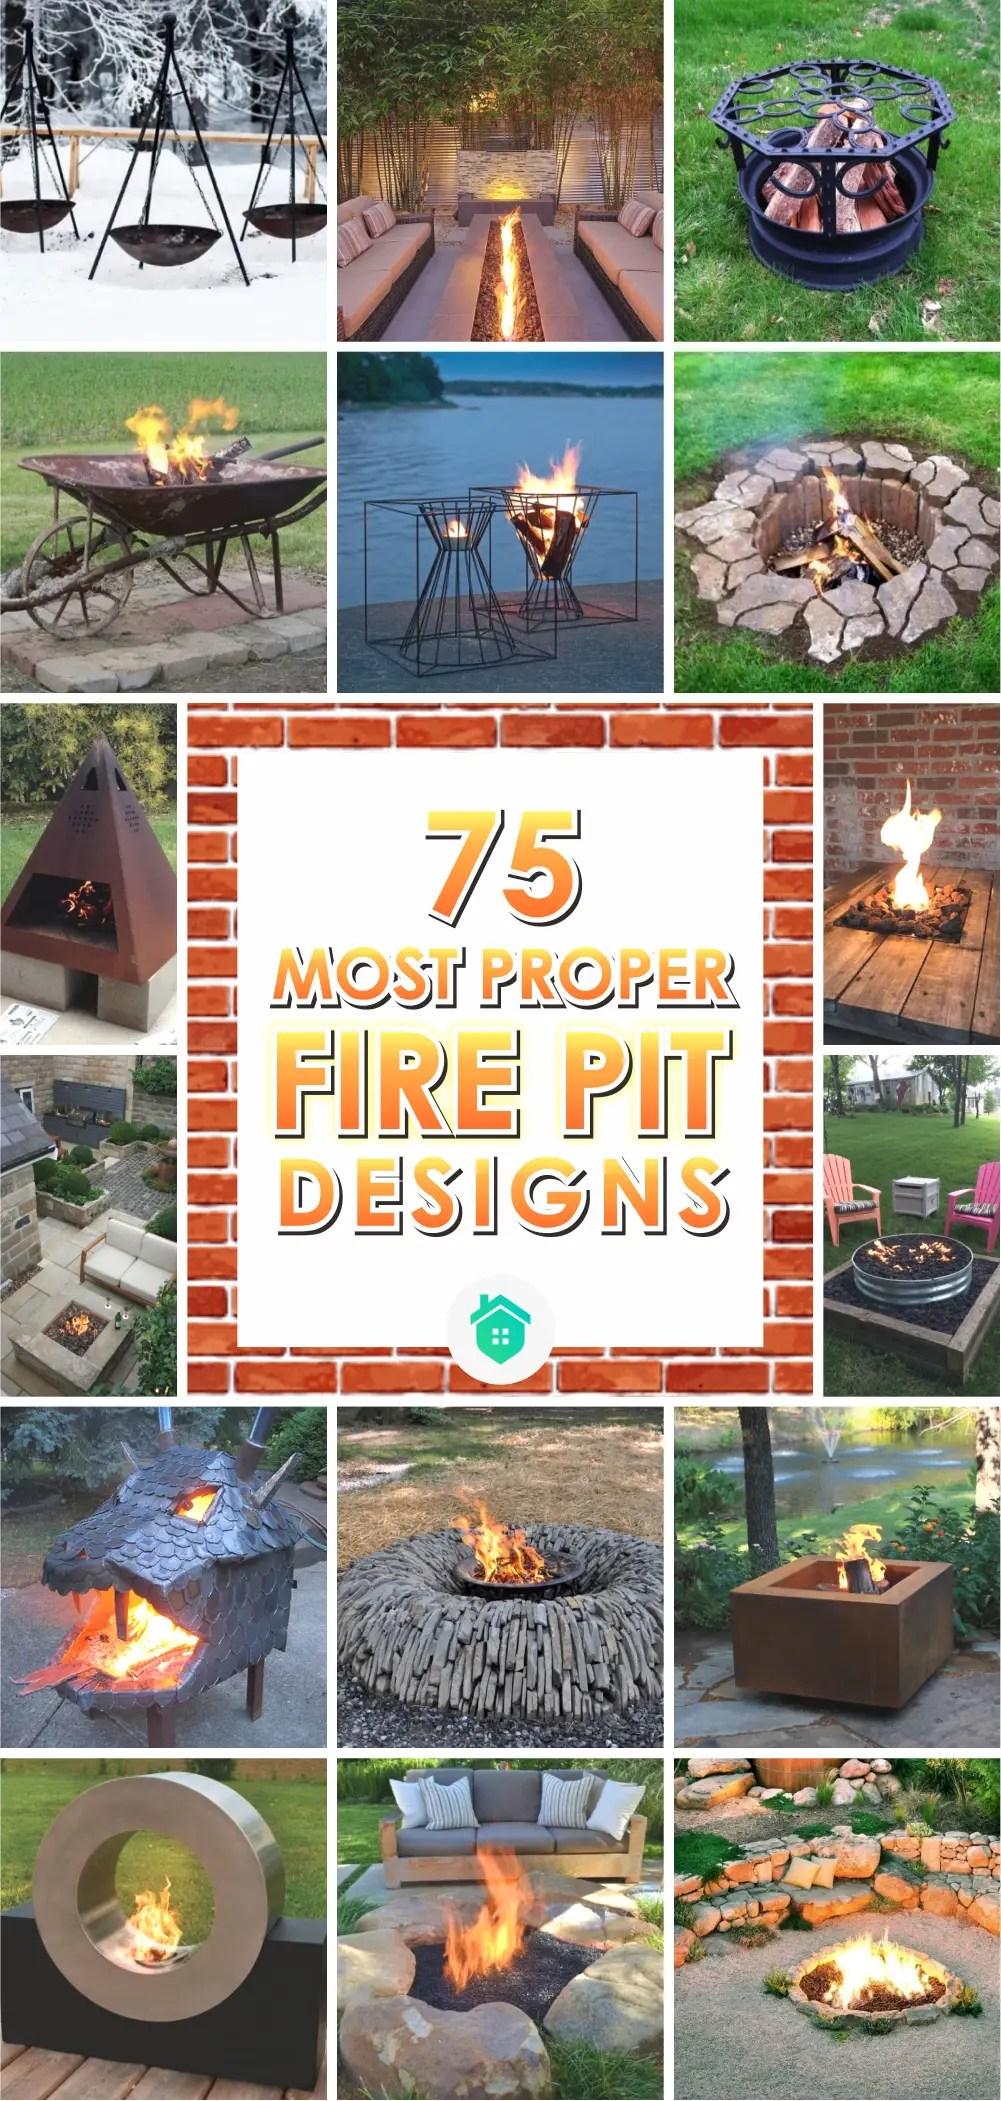 75 most proper fire pit designs 1